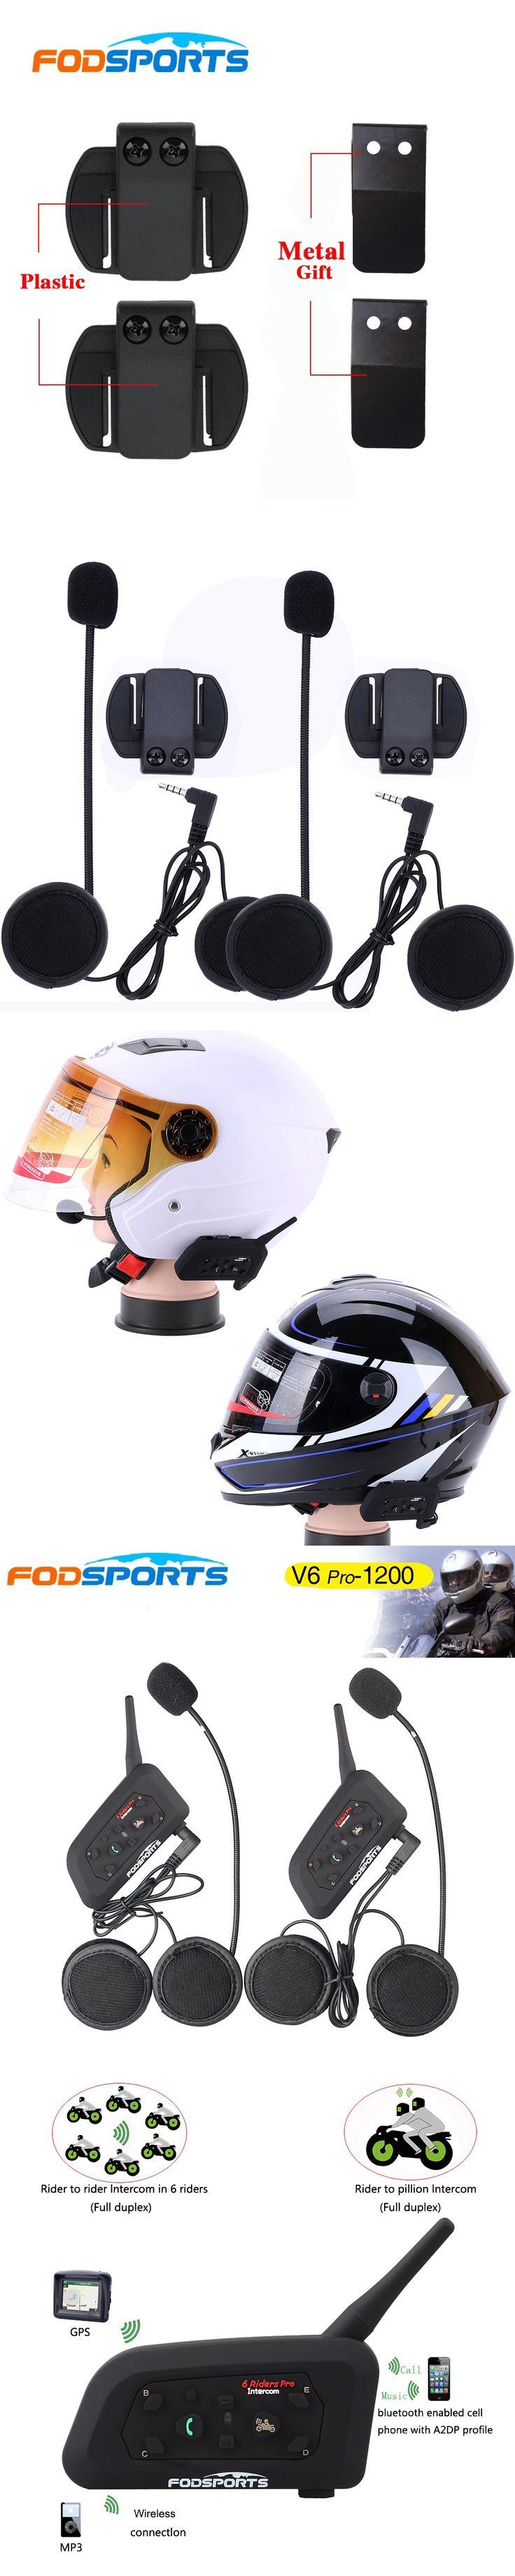 2017 Fodsports Brand! Metal clip +2 pcs V6 Pro BT Interphone 1200M Motorcycle Bluetooth Helmet Intercom headset for 6 Rider